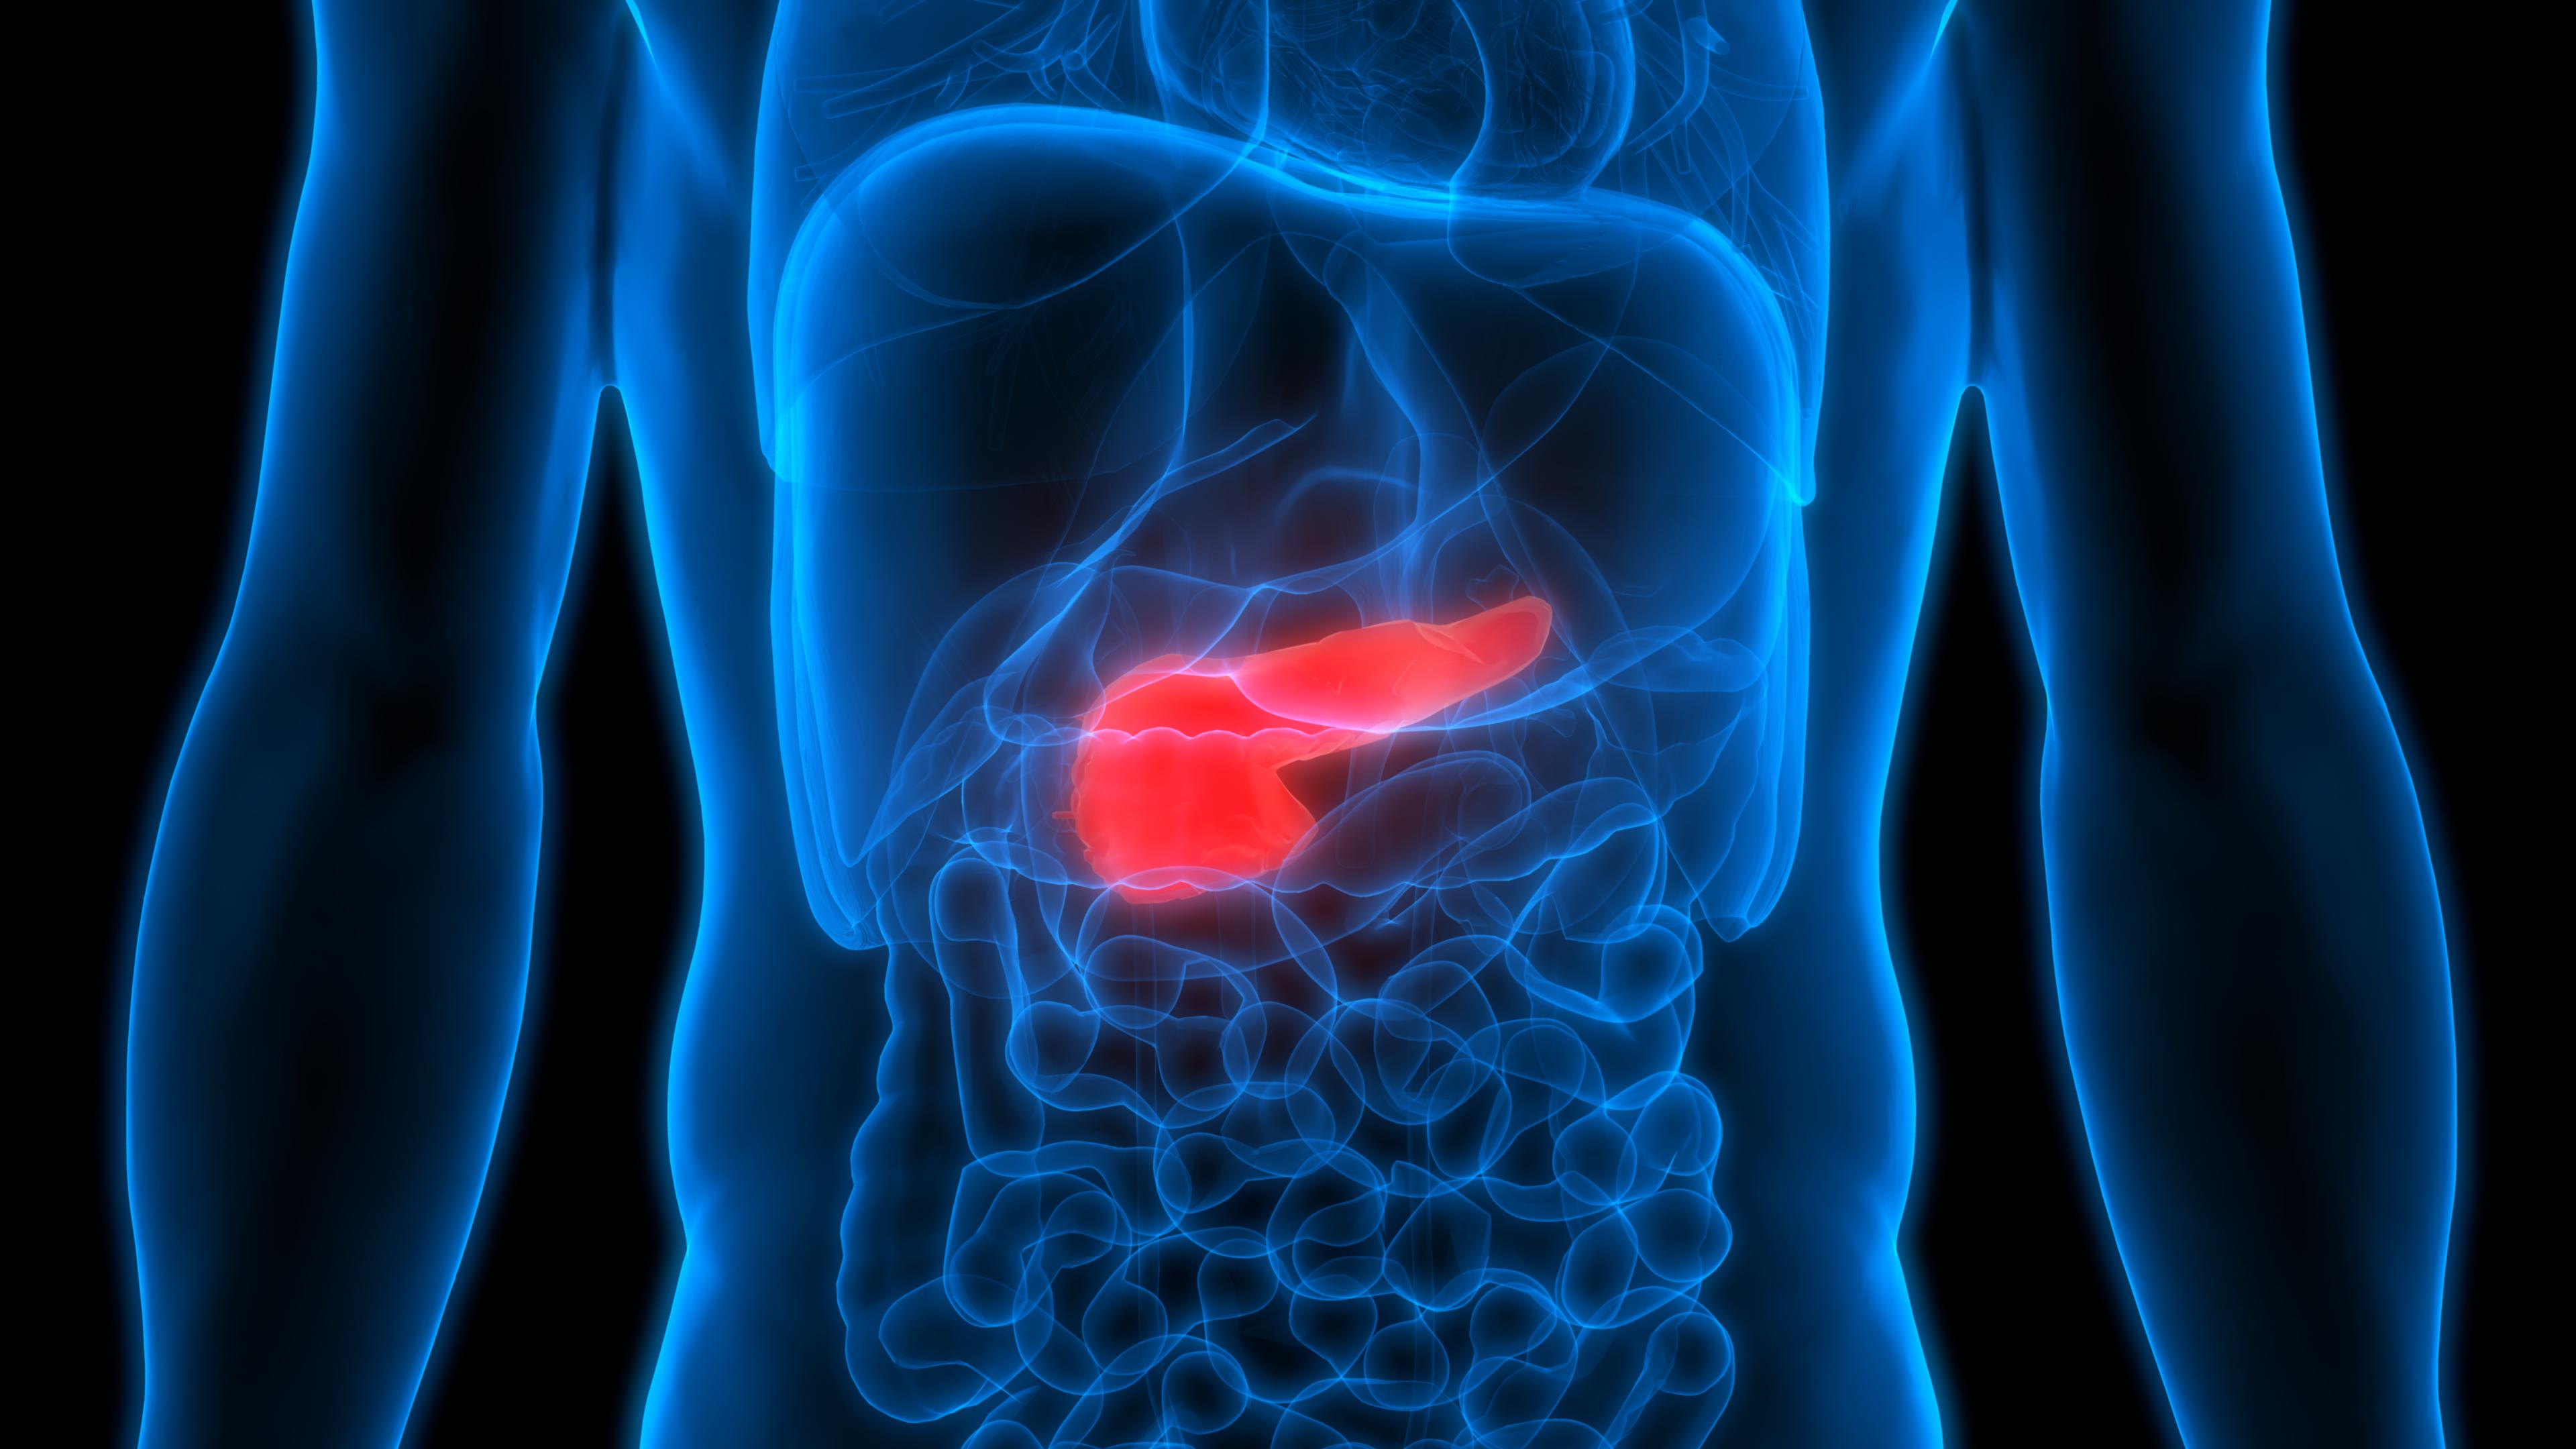 3D Illustration of Human Body Organs Anatomy (Pancreas)